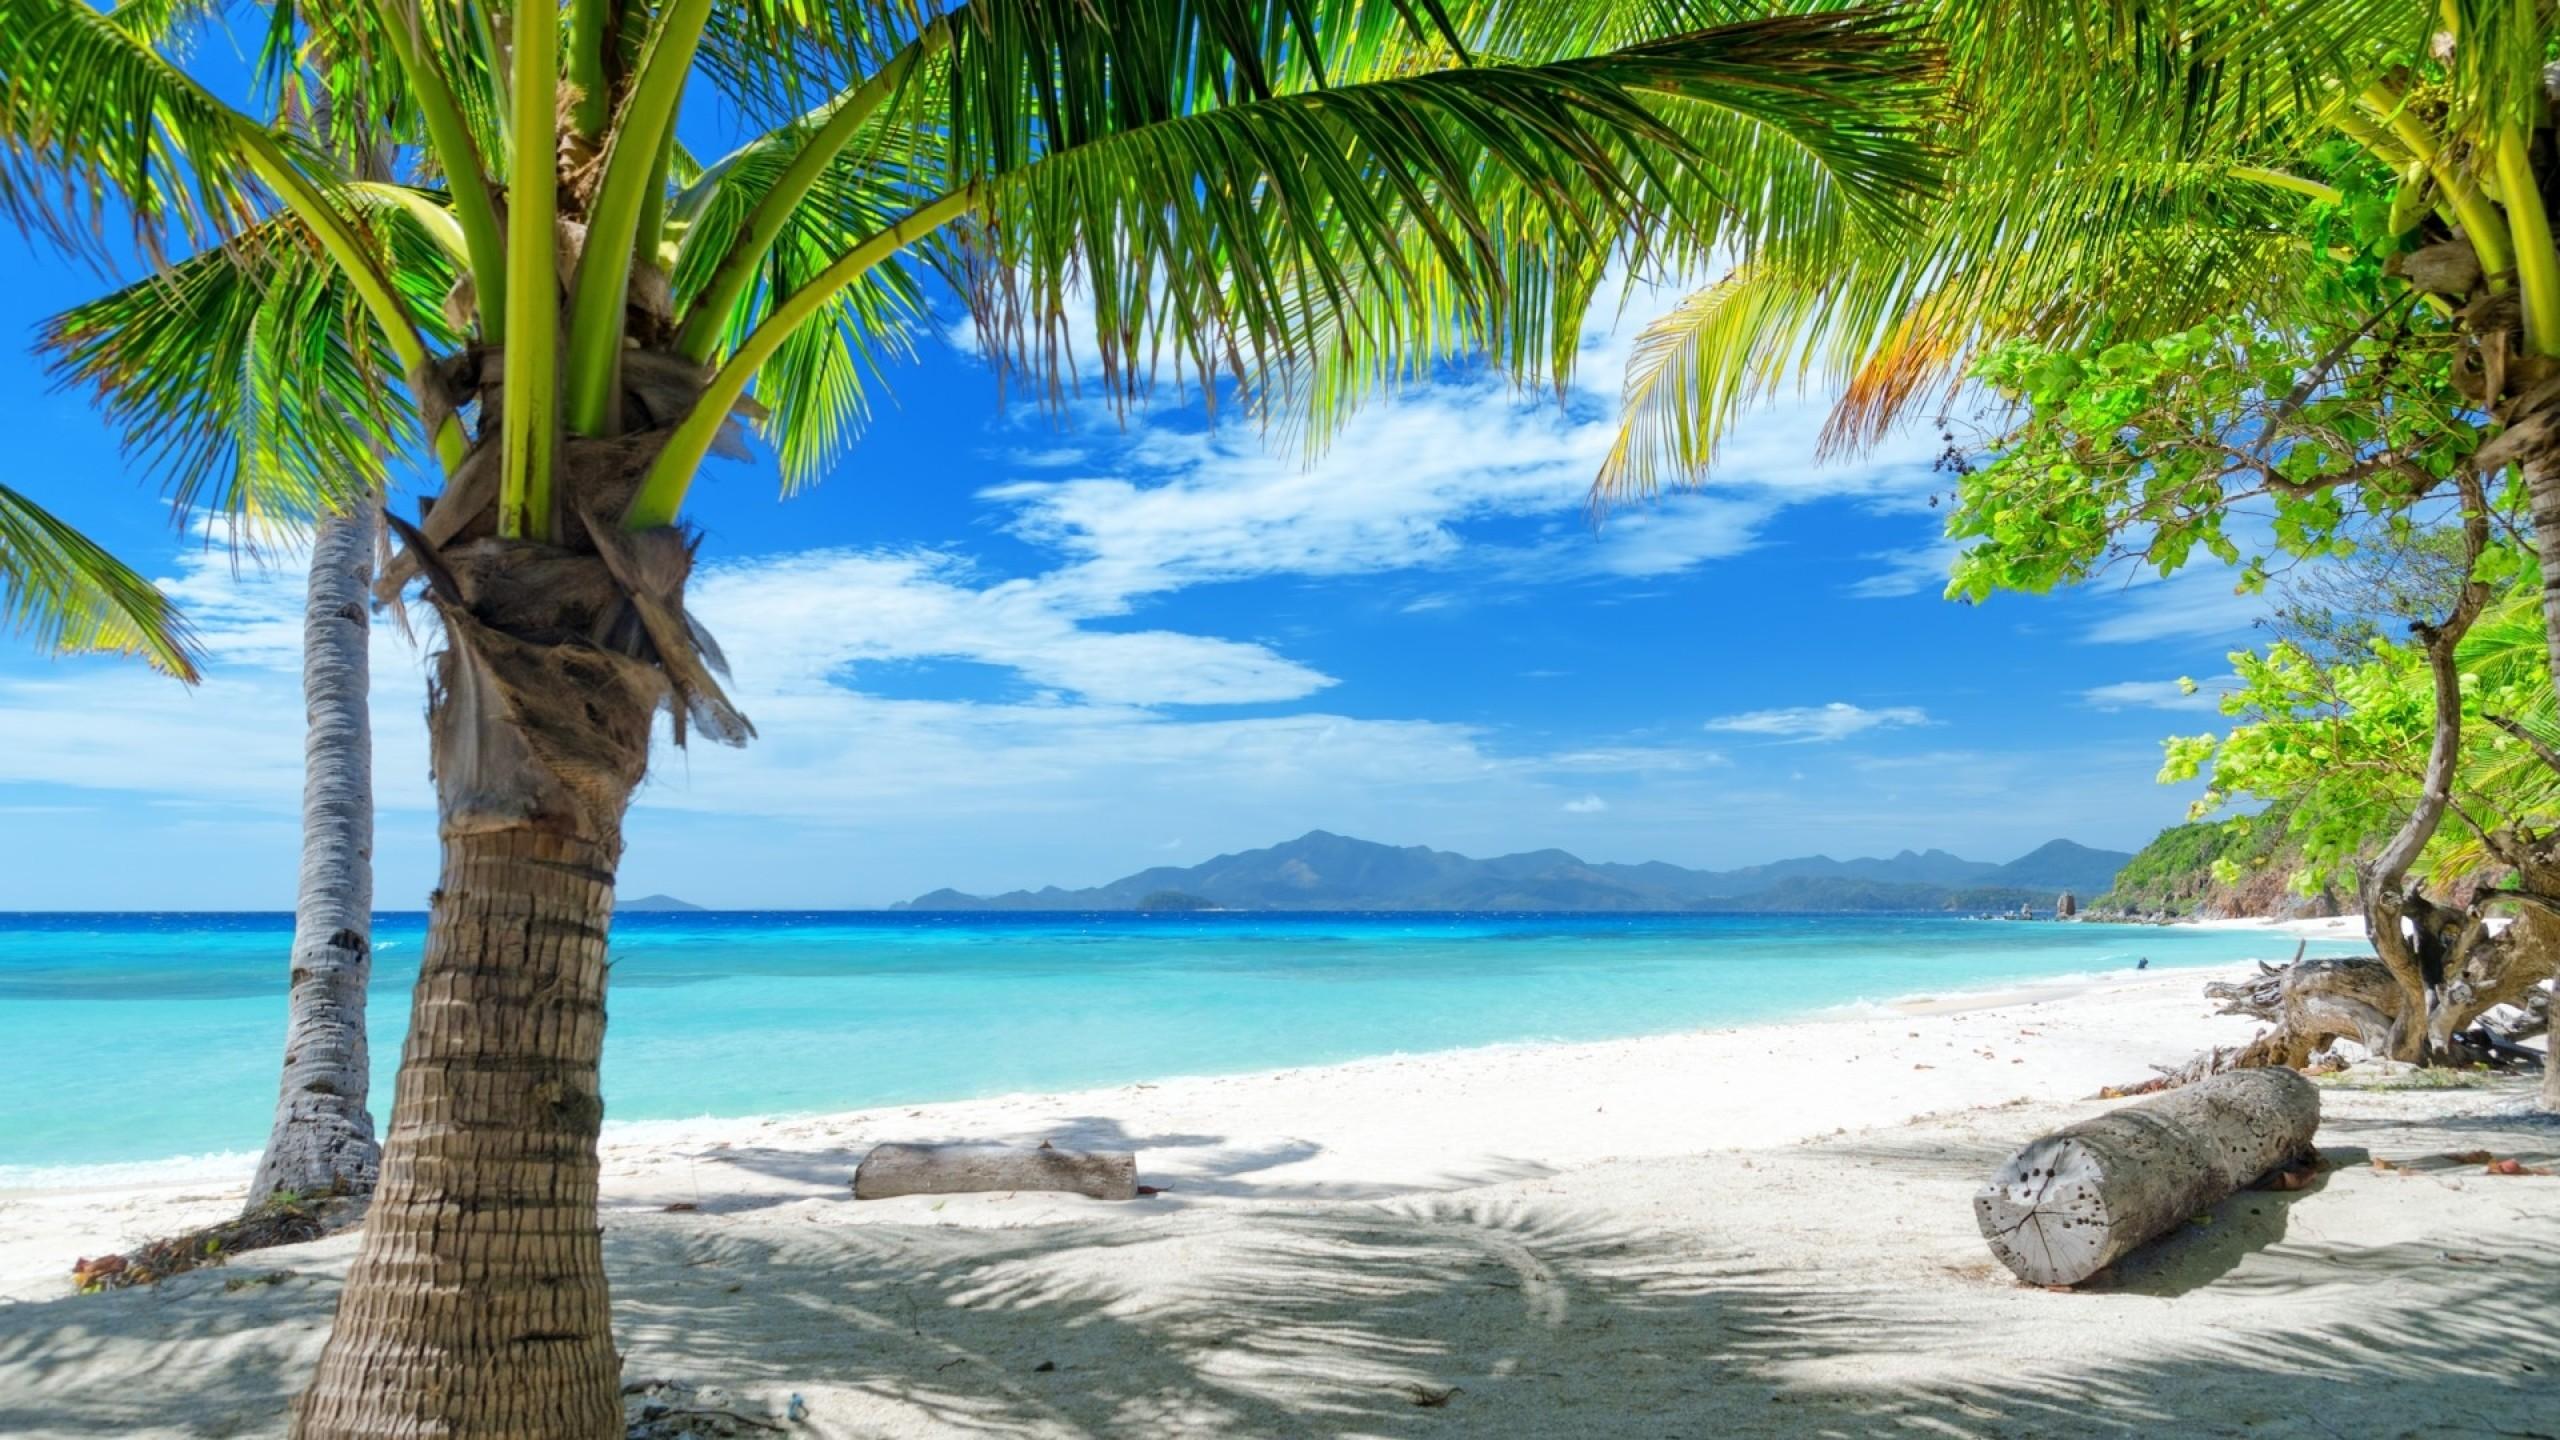 Wallpaper tropics, beach, sand, palm trees